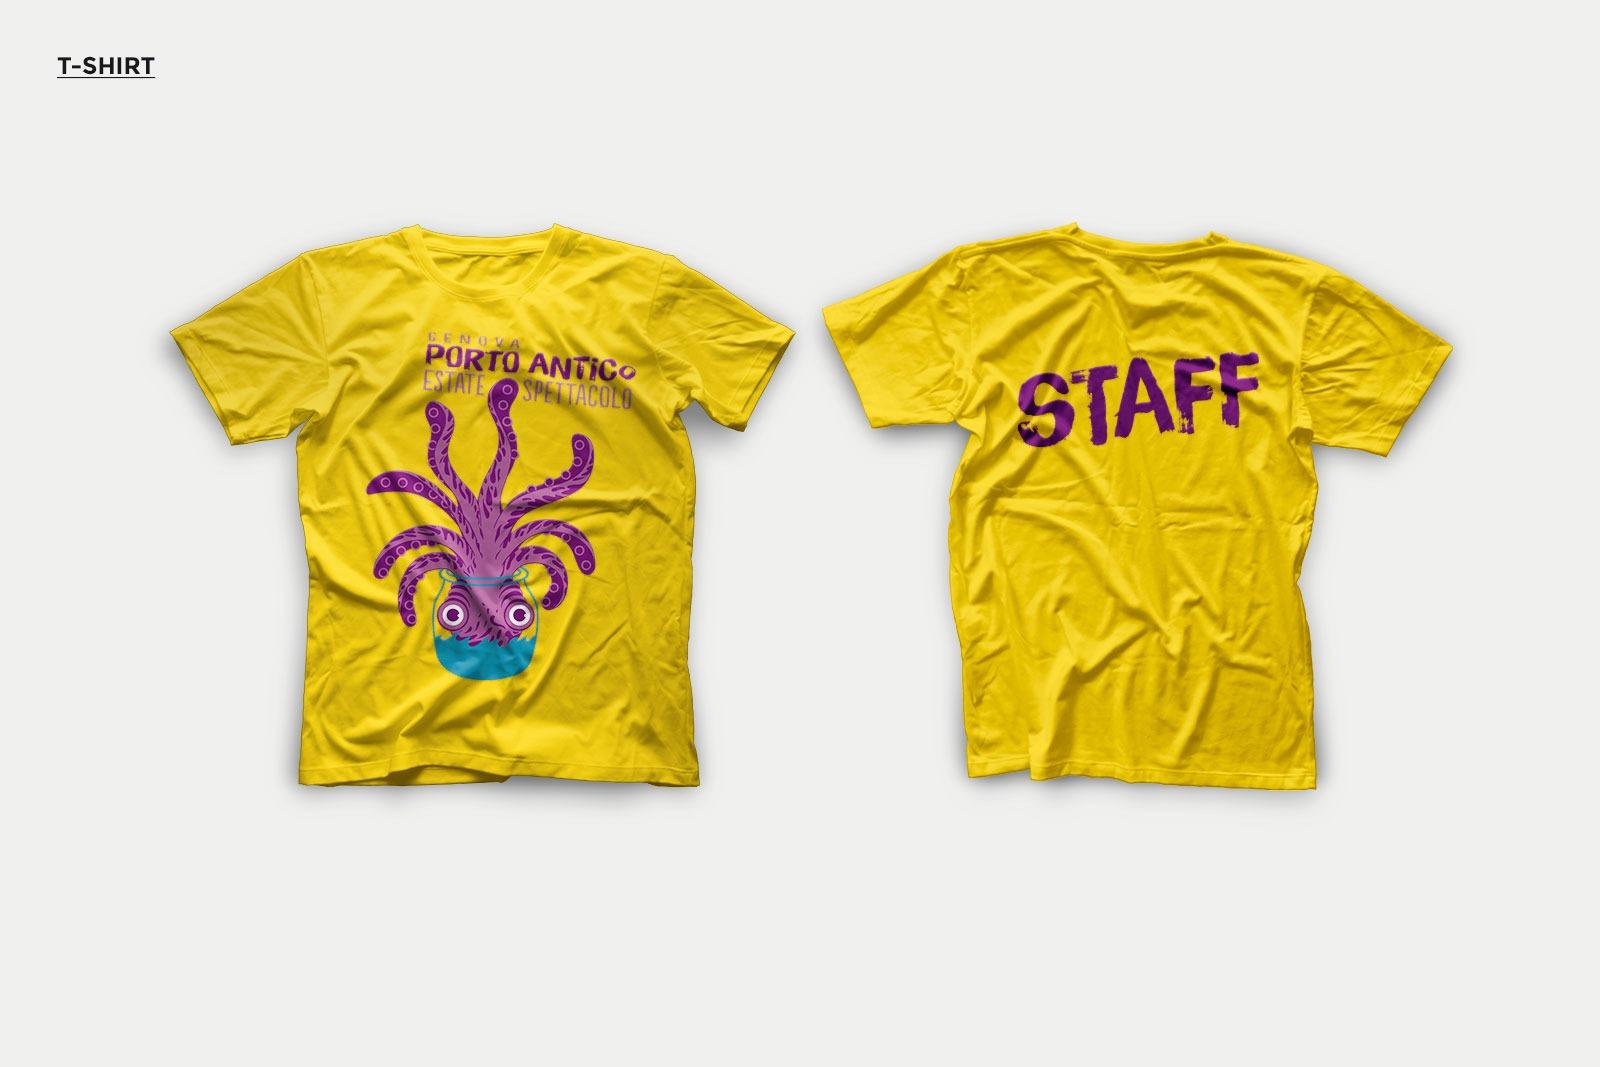 render-t-shirt-estatespettacolo2015